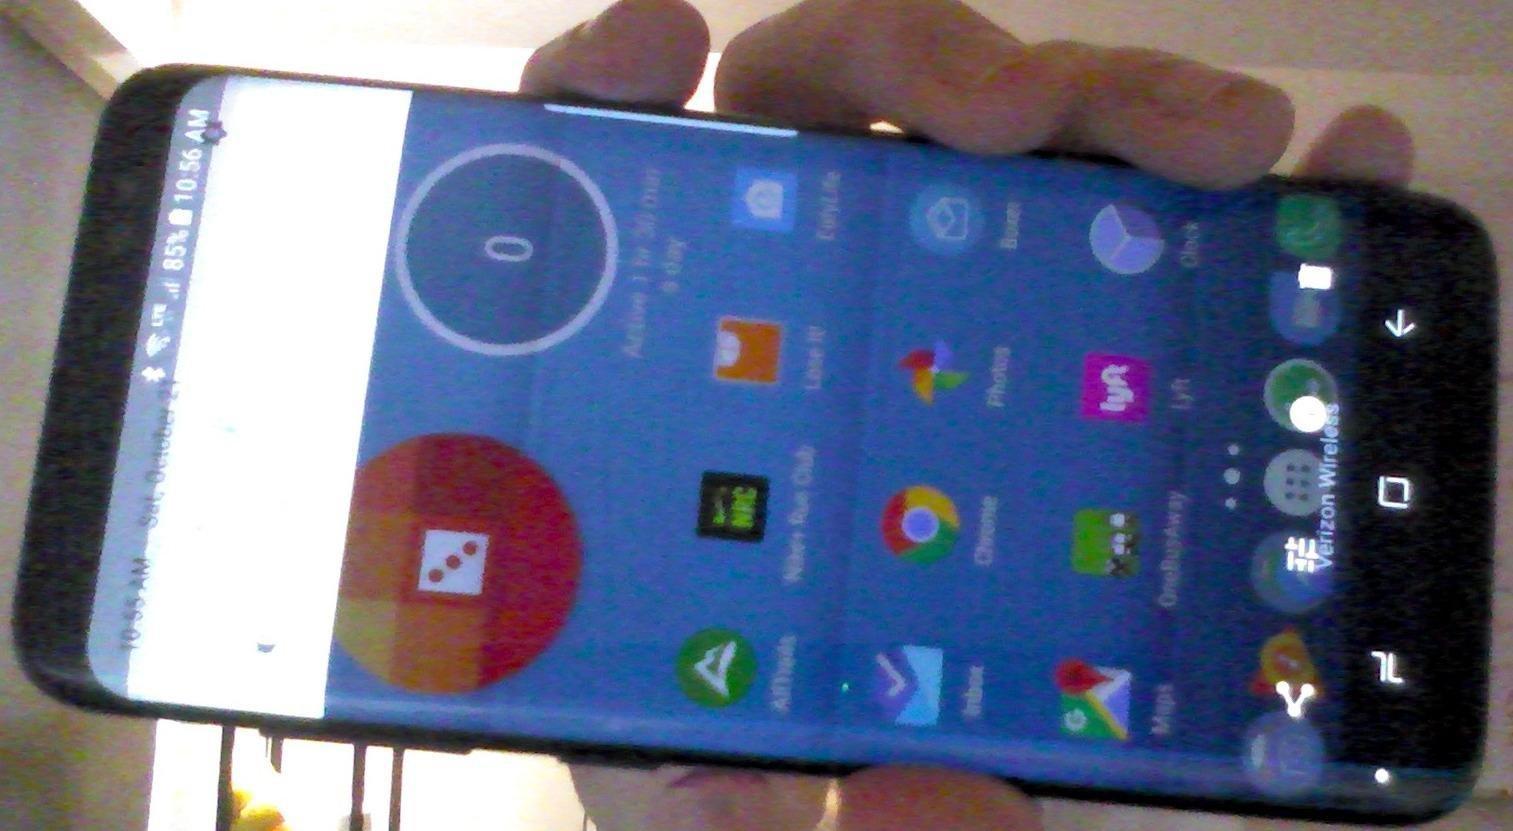 Samsung Galaxy S8 64GB Factory Unlocked Smartphone - US